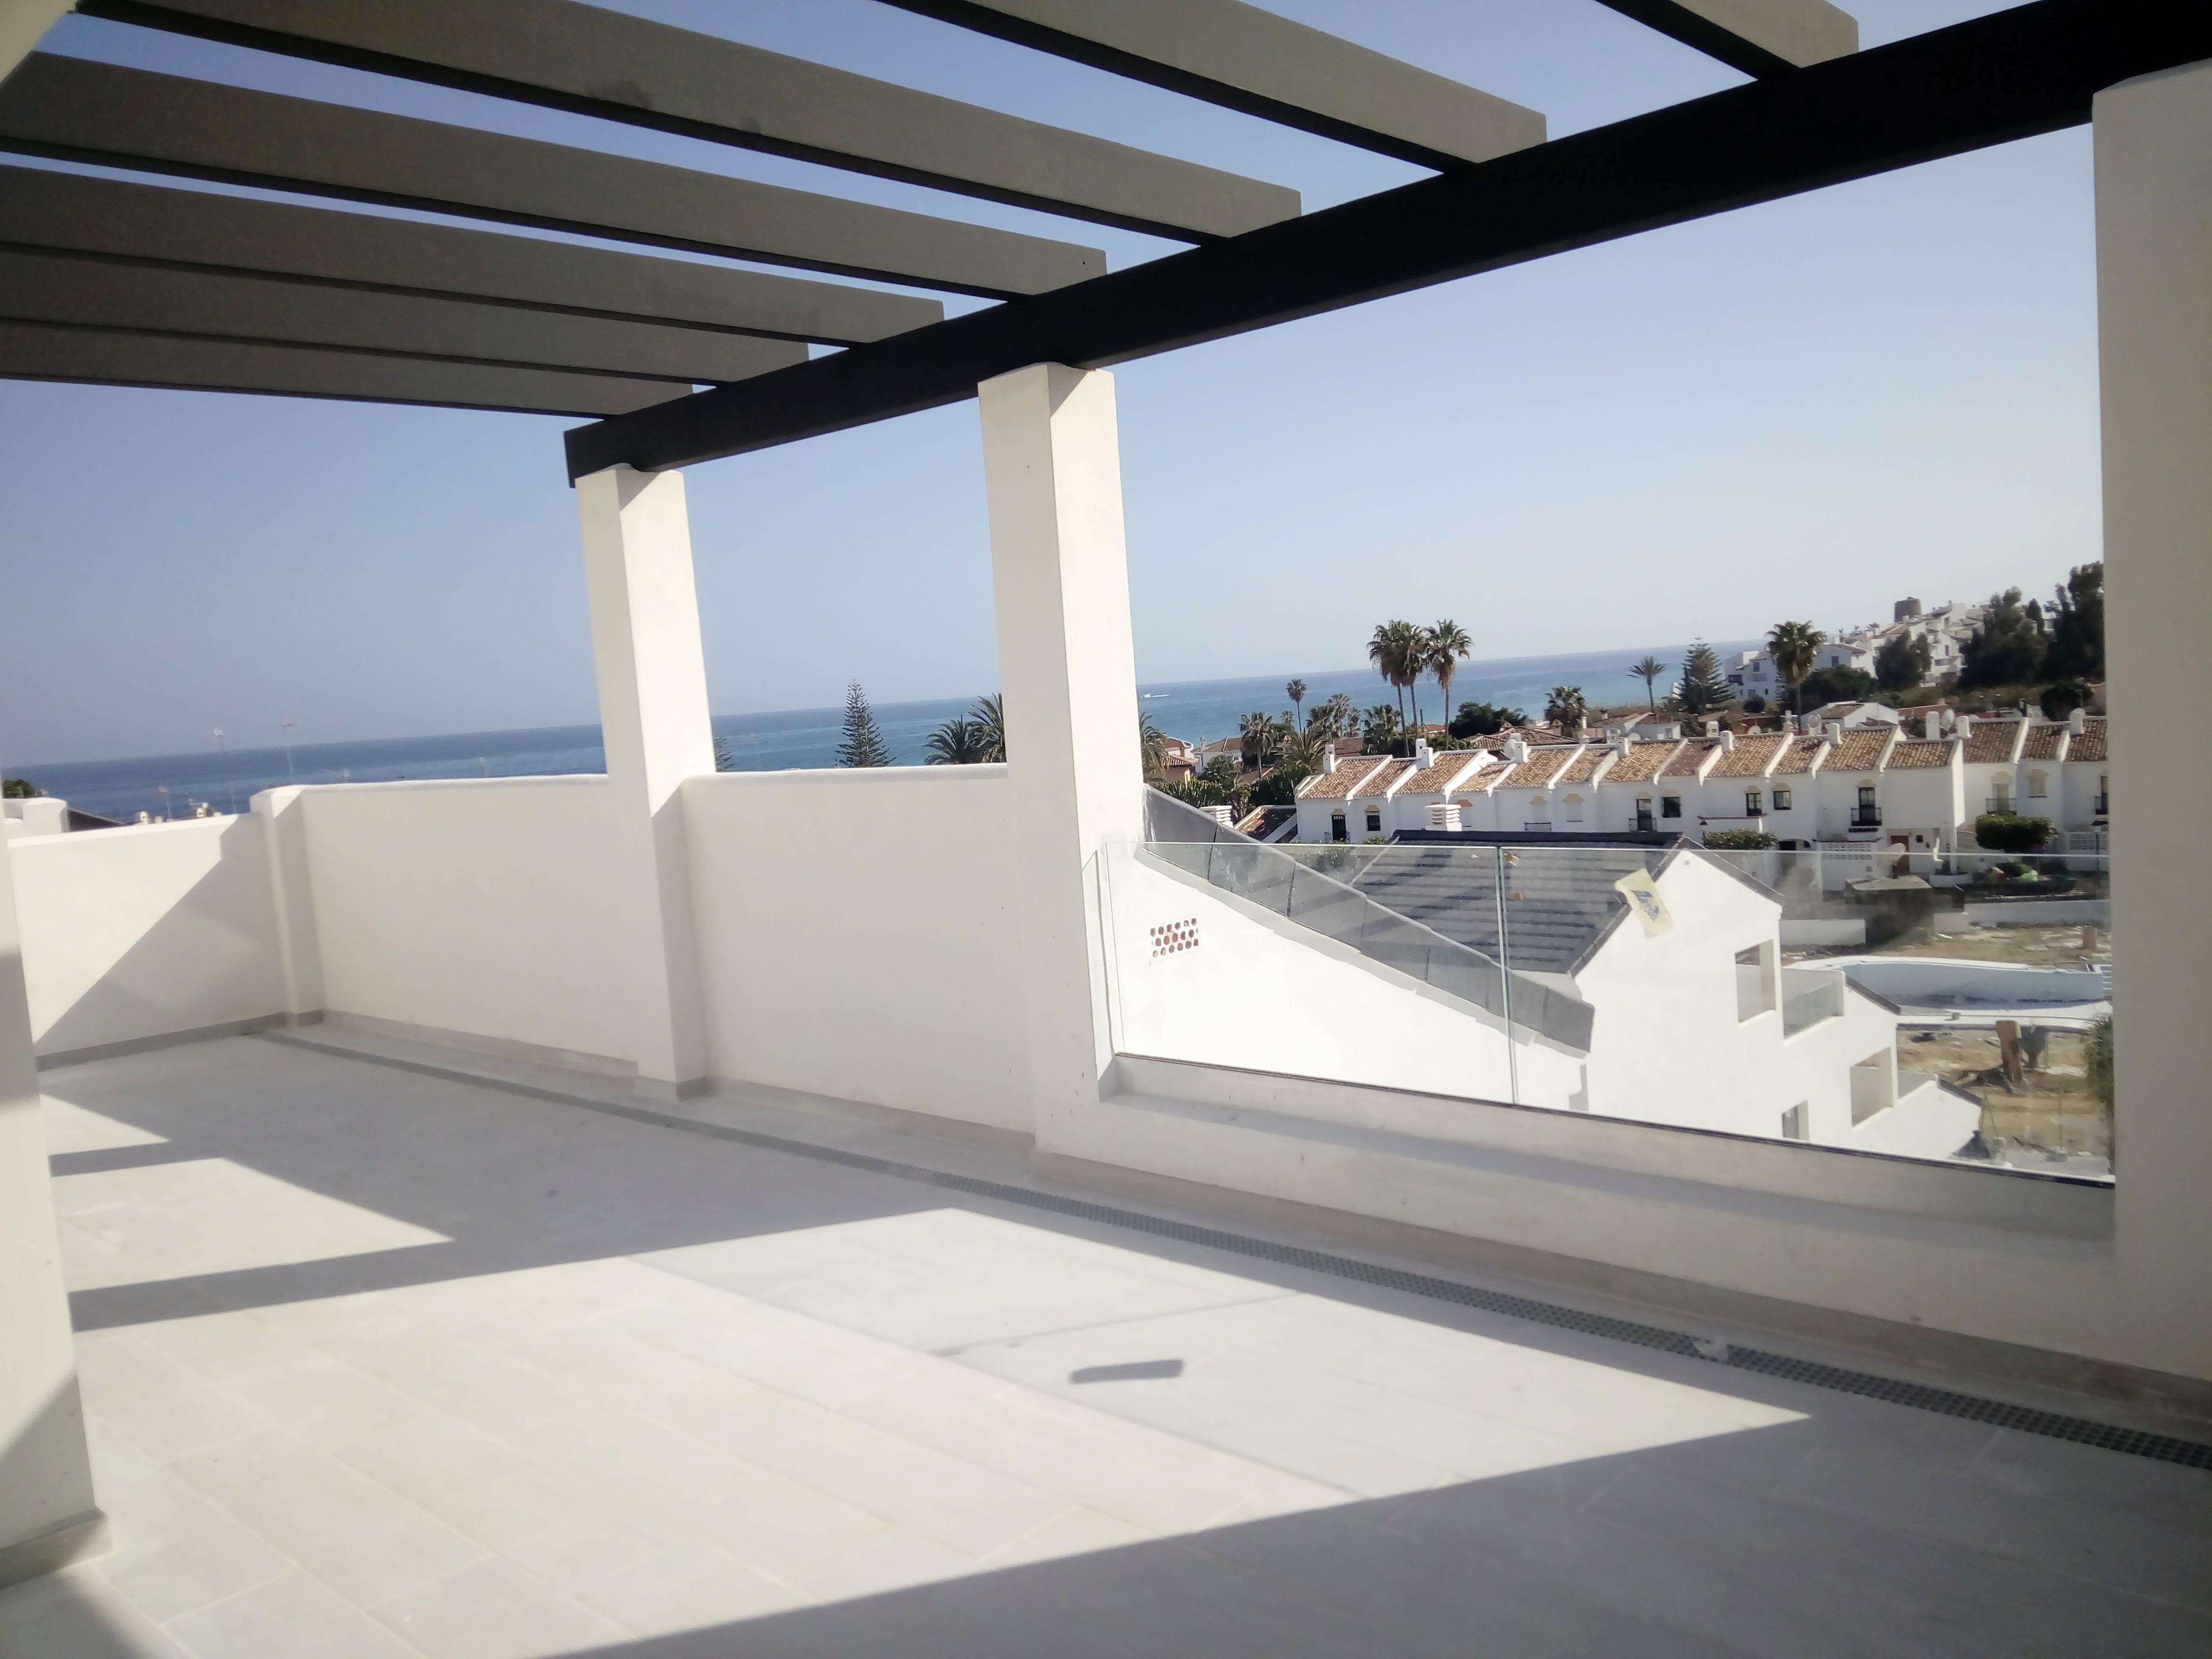 Cordoba penthouse bloc 3 B ground floor terrace out